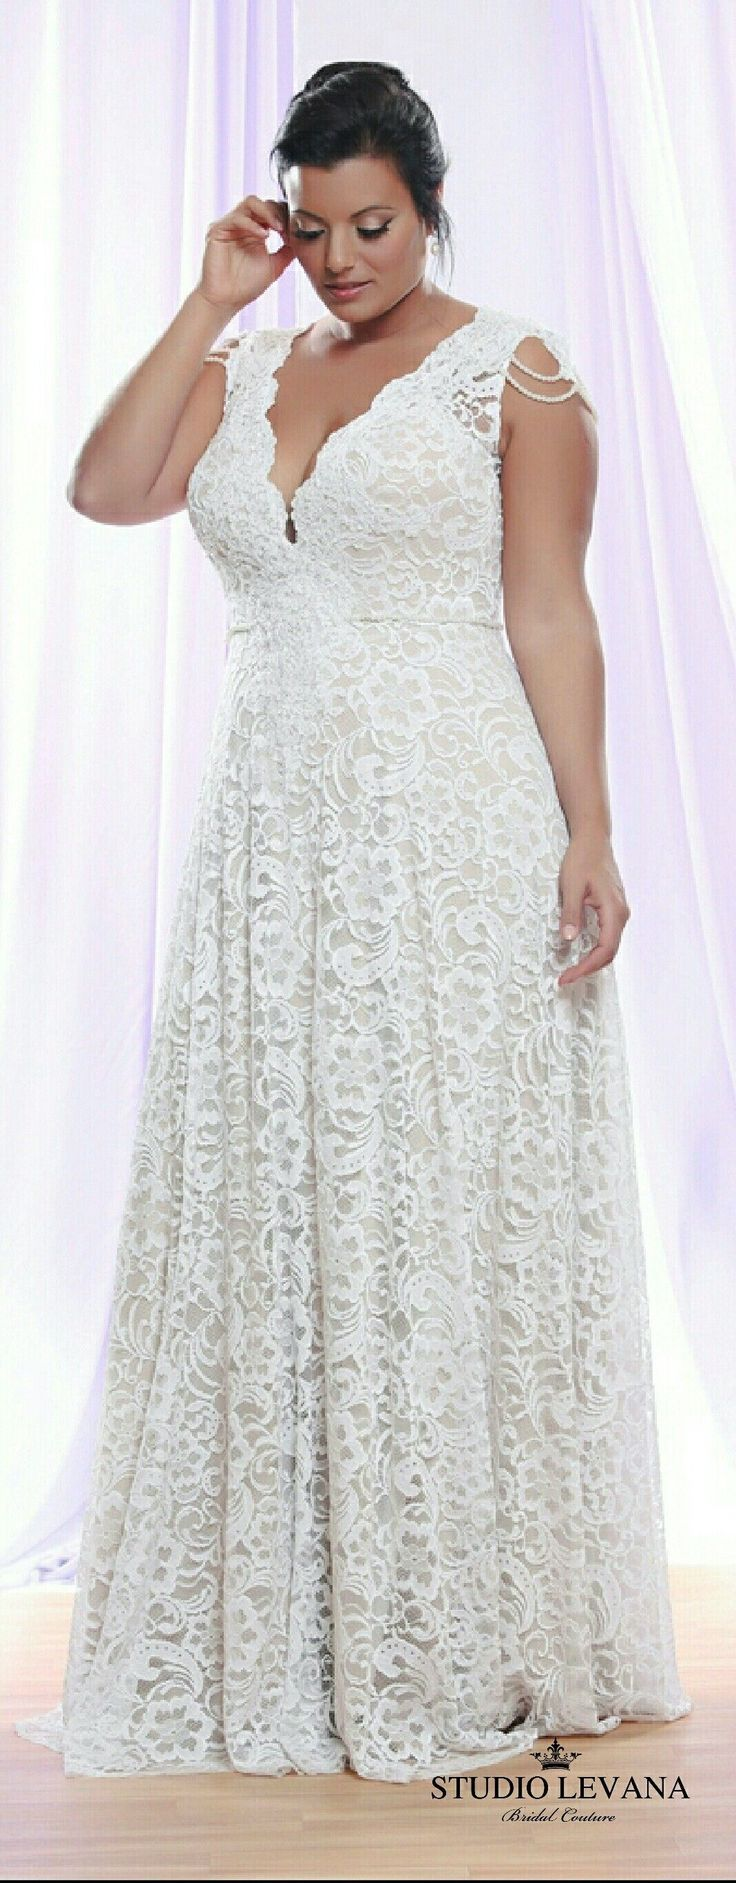 578 best wedding images on Pinterest | Backstage, Blouse dress and ...